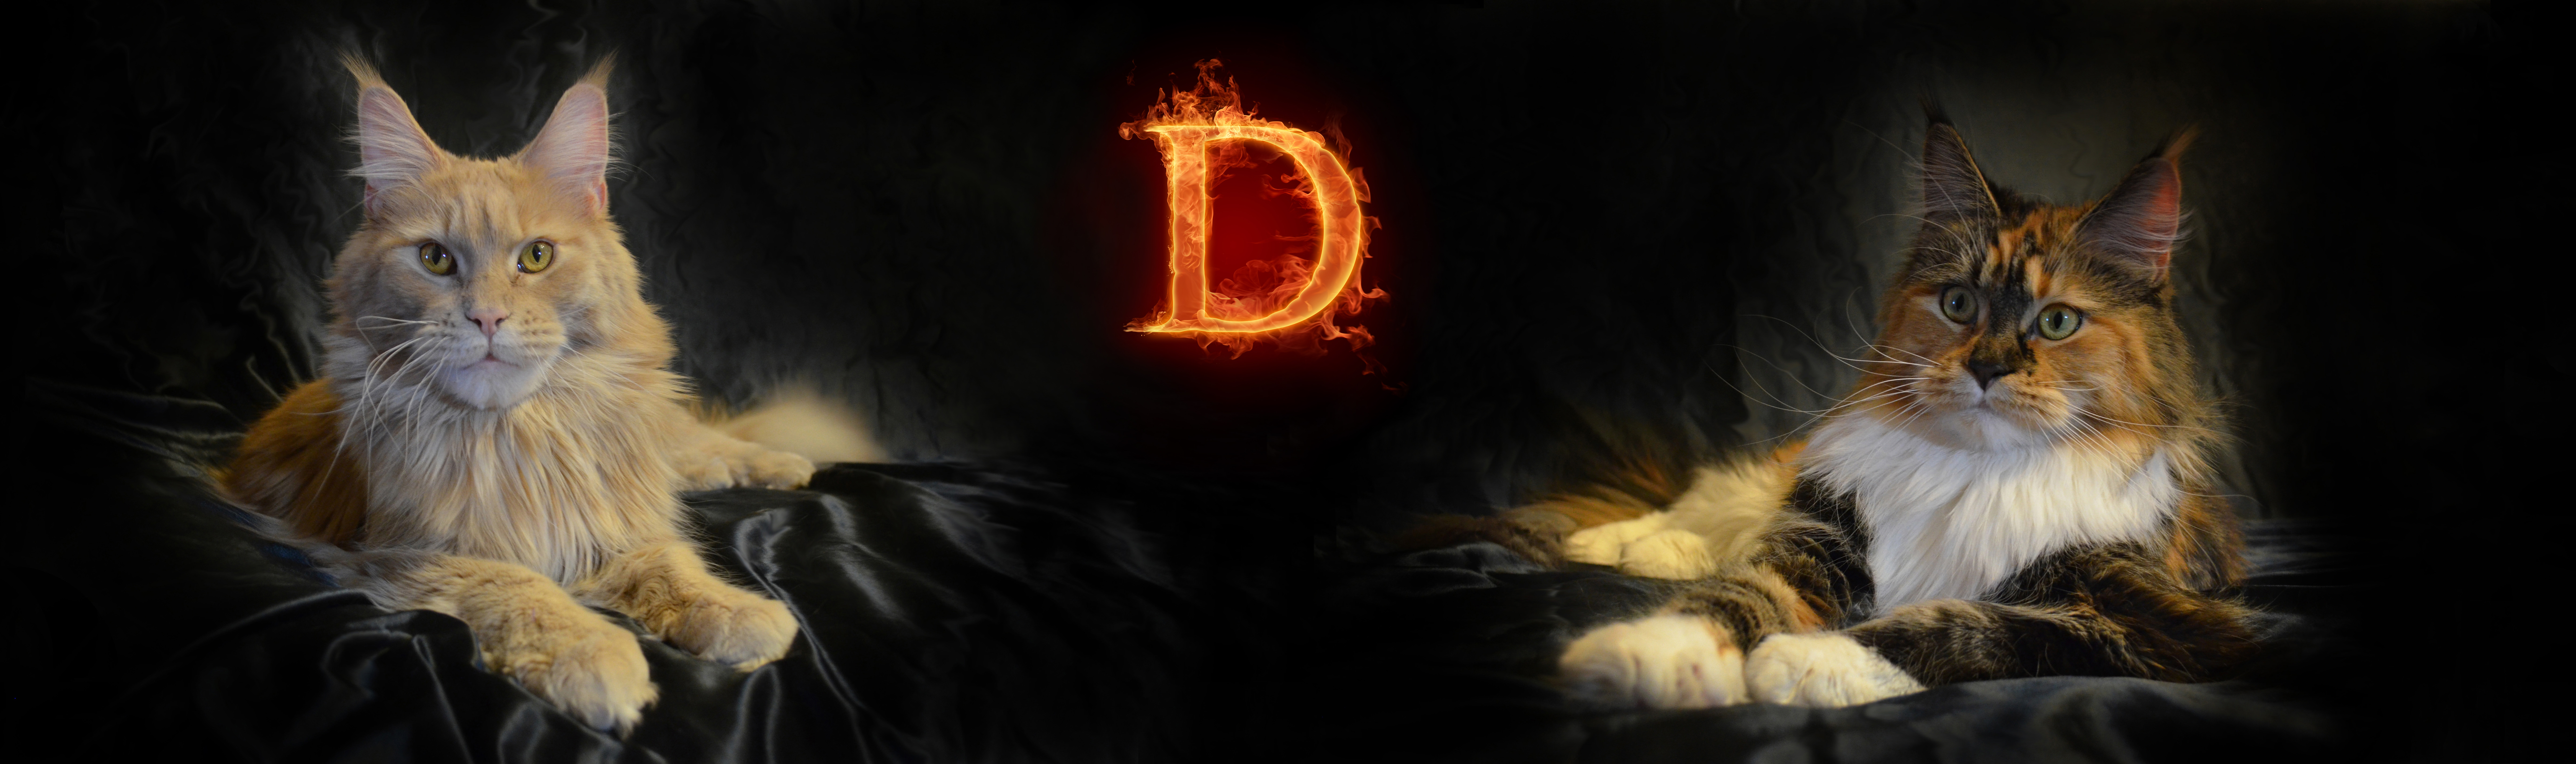 Dragon Heart питомник мейн кунов